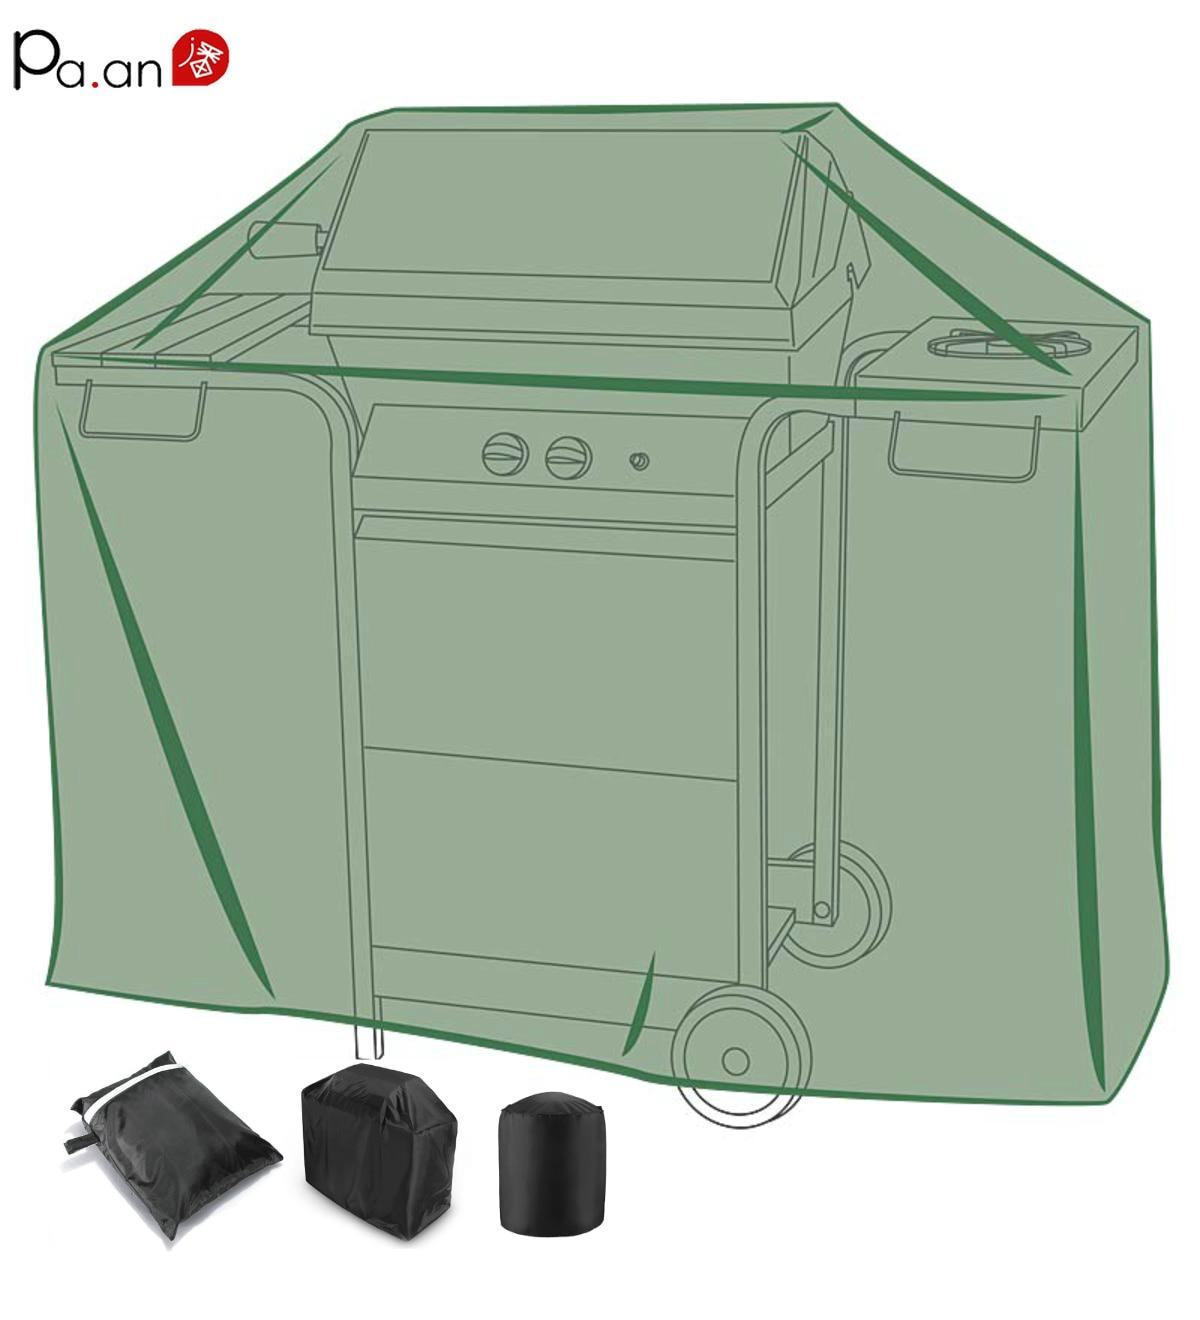 Rainproof Patio Furniture.Us 10 65 29 Off Black Silver Bbq Grill Cover Waterproof Barbeque Covers Patio Garden Accessories Outdoor Furniture Dustproof Rainproof Durable In